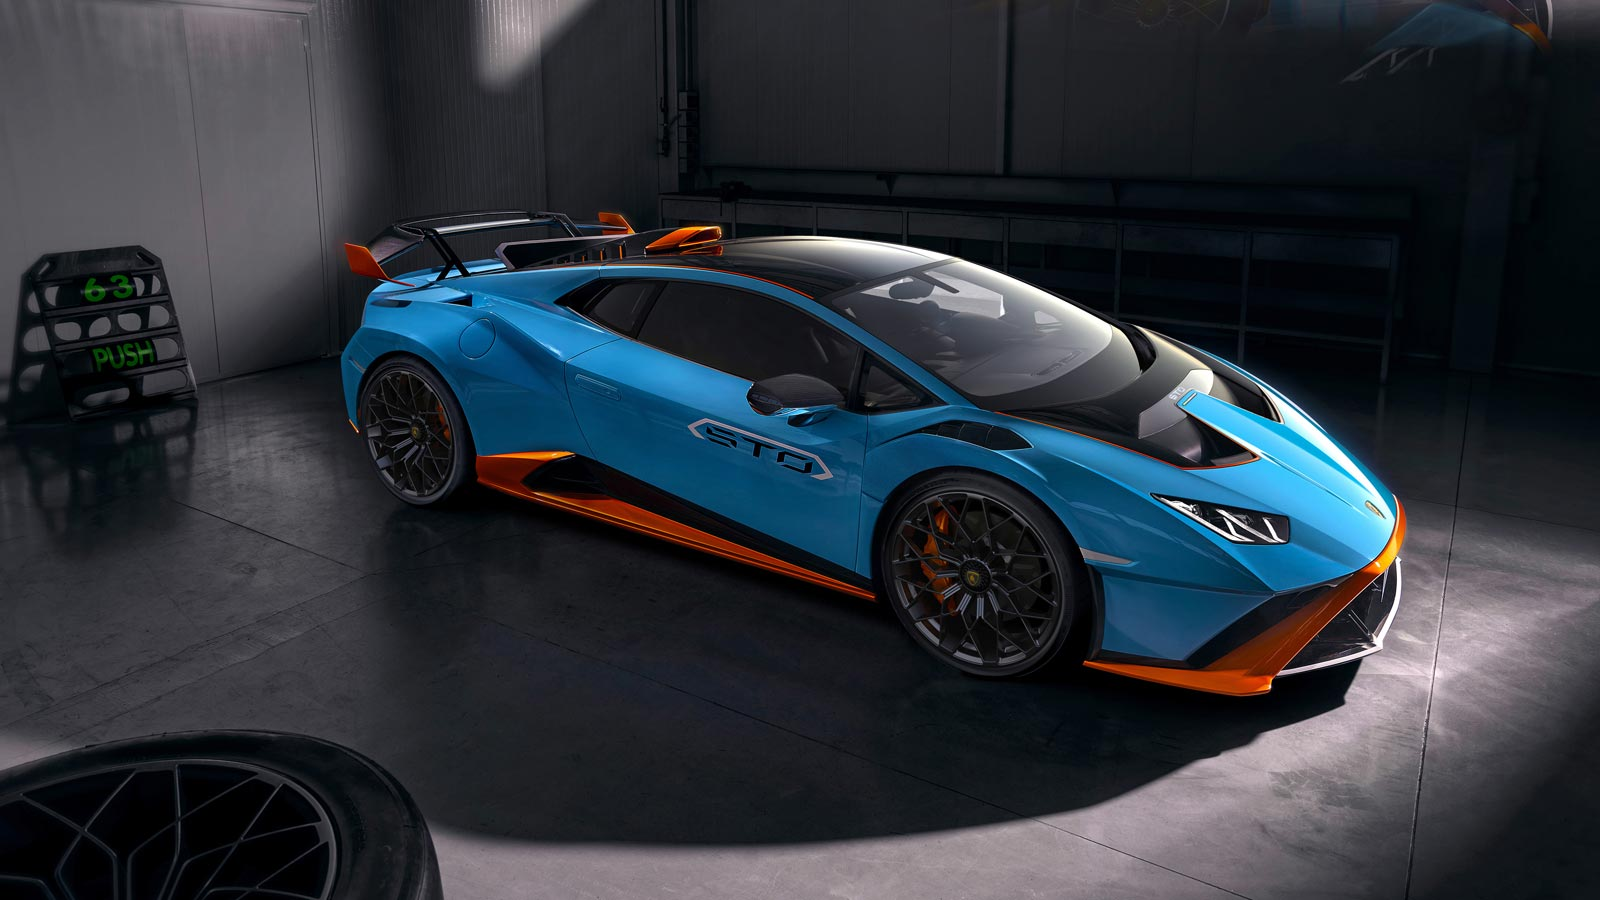 Lamborghini Huracan STO - From racetrack to road image 8